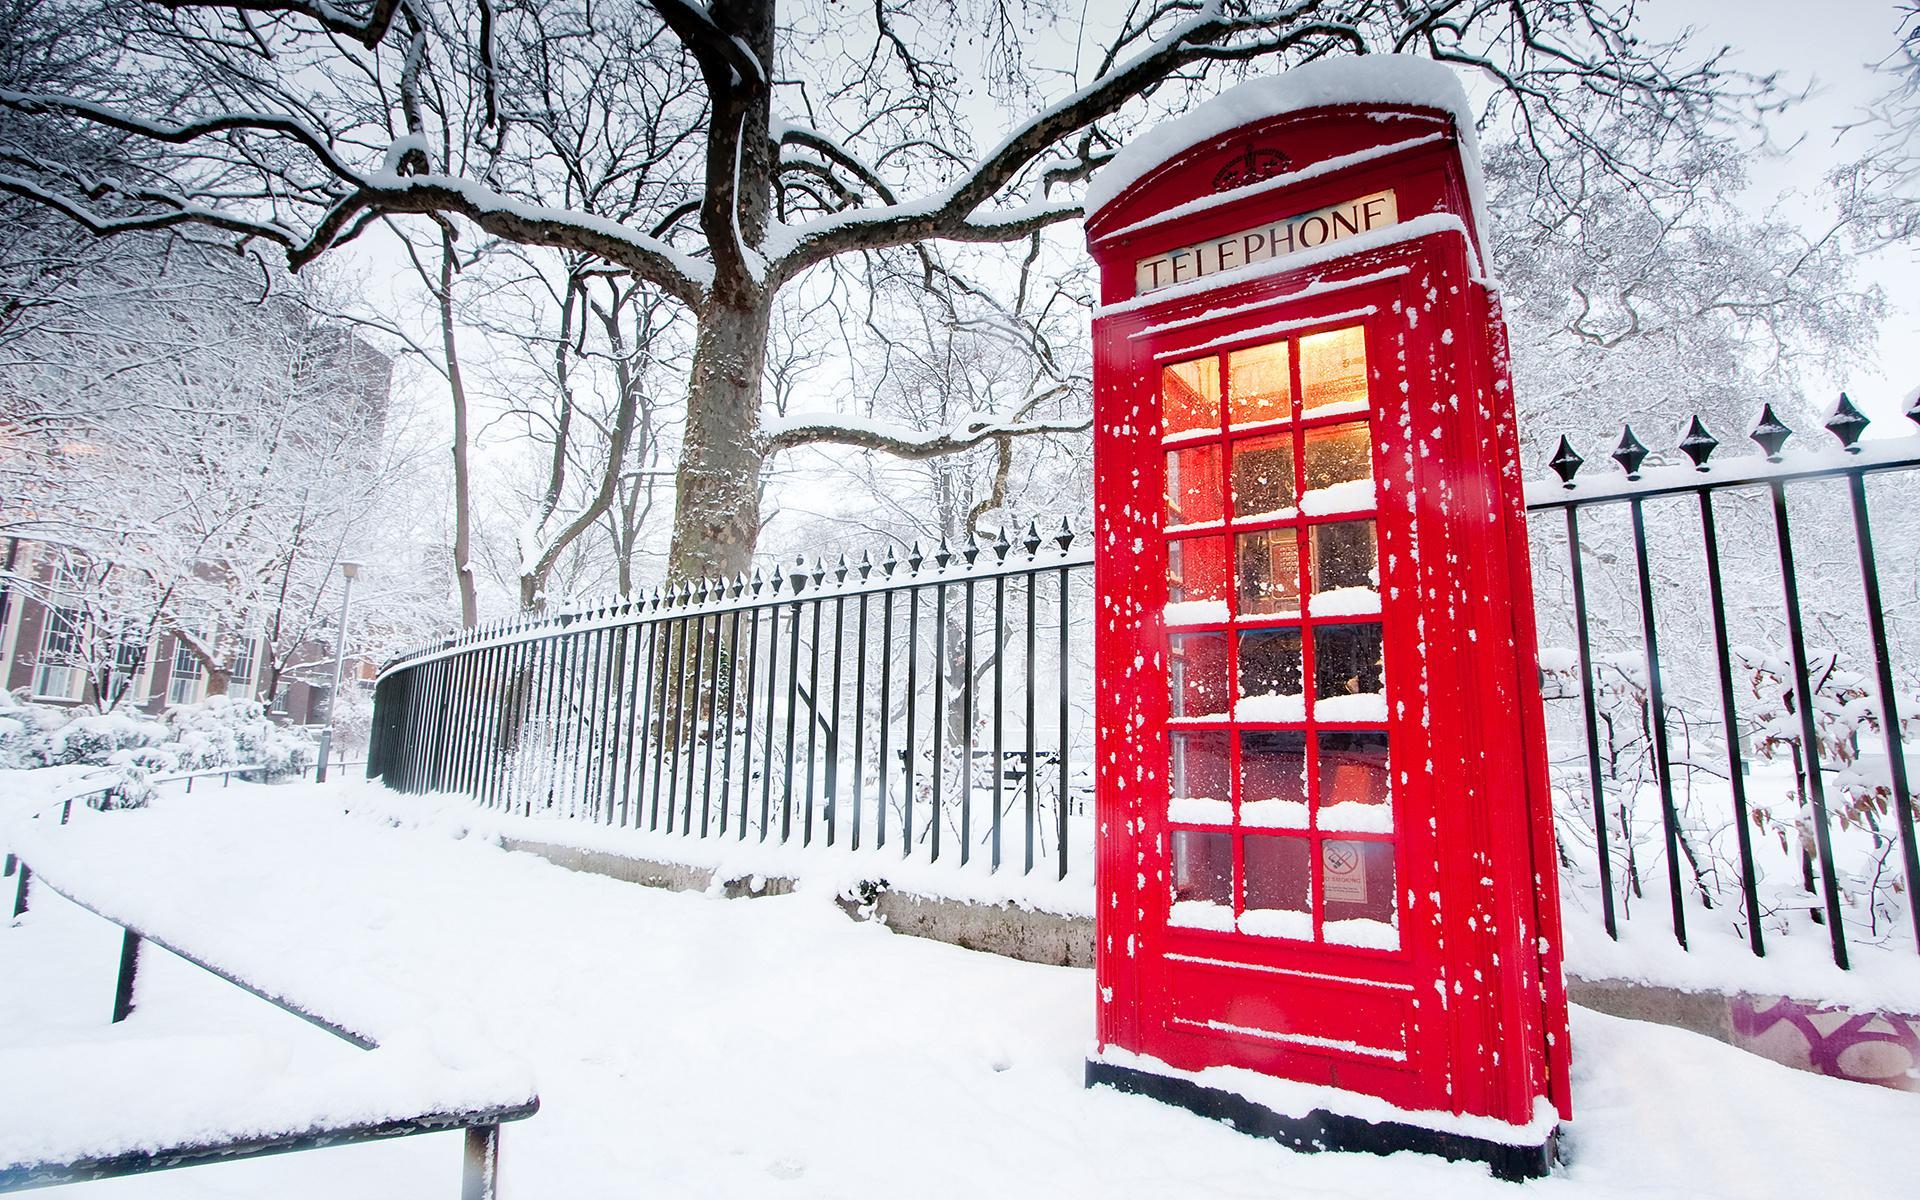 Англия лондон телефонная будка зима